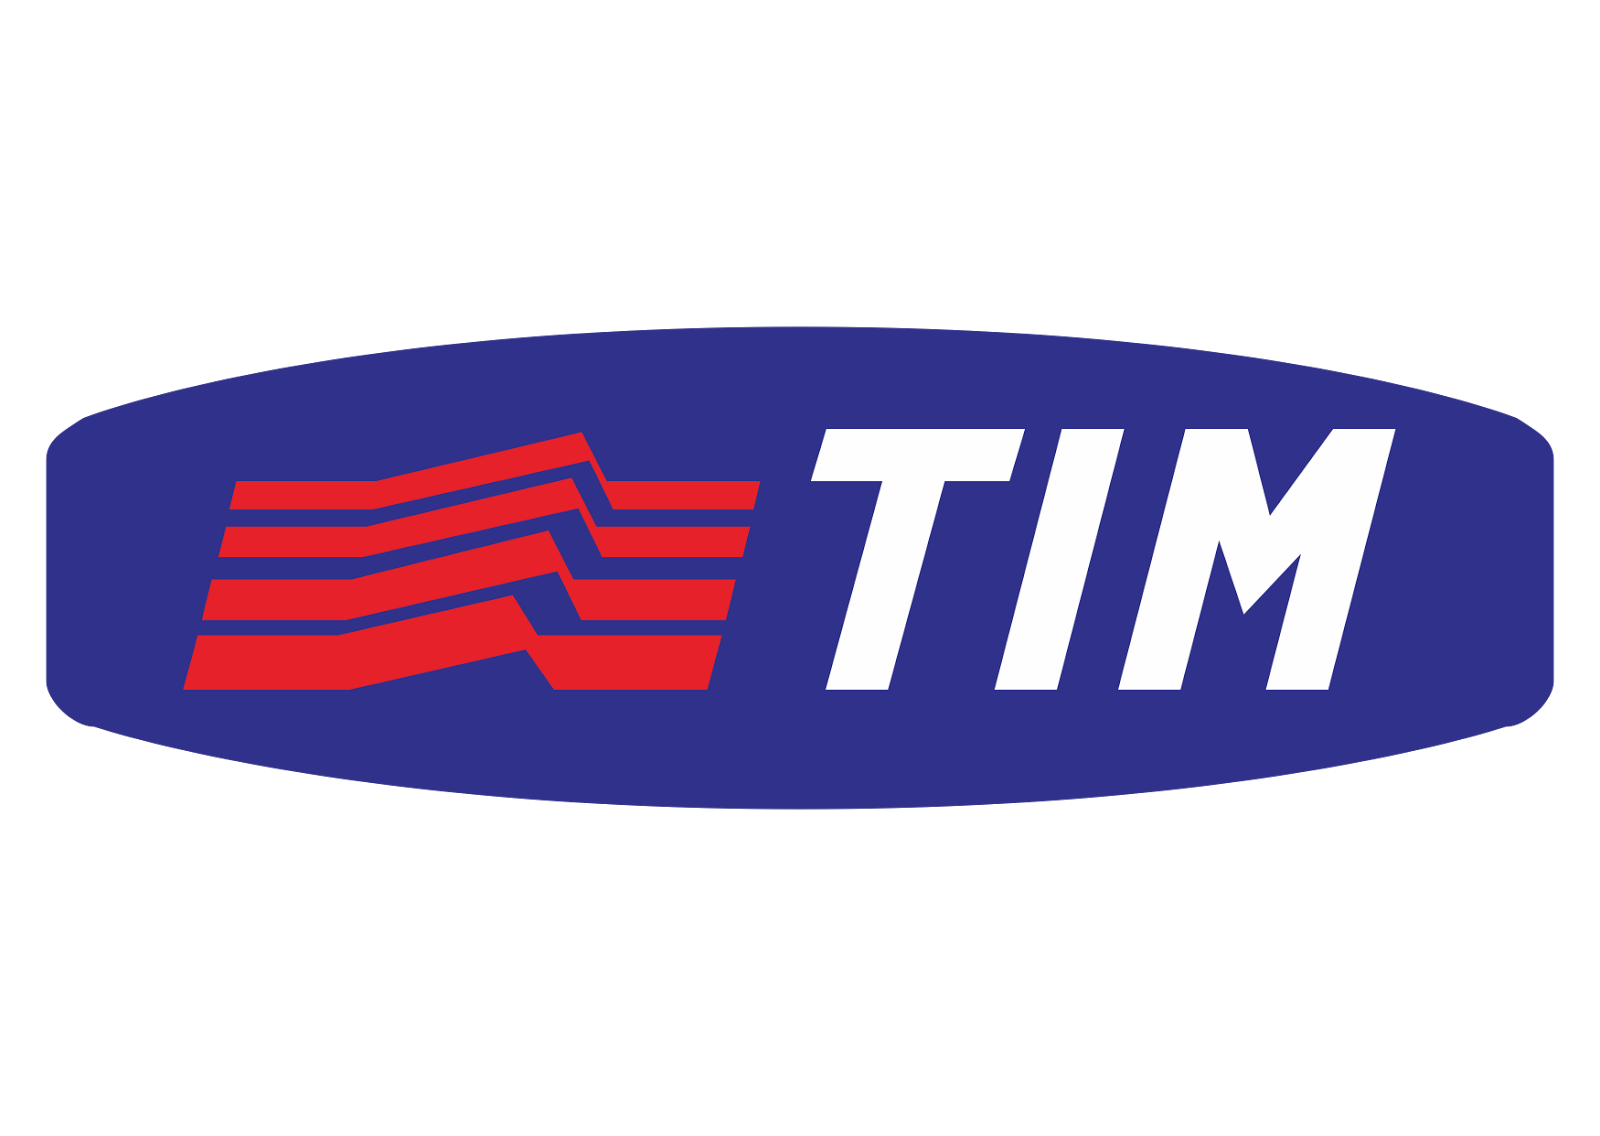 tim telecom company png logo